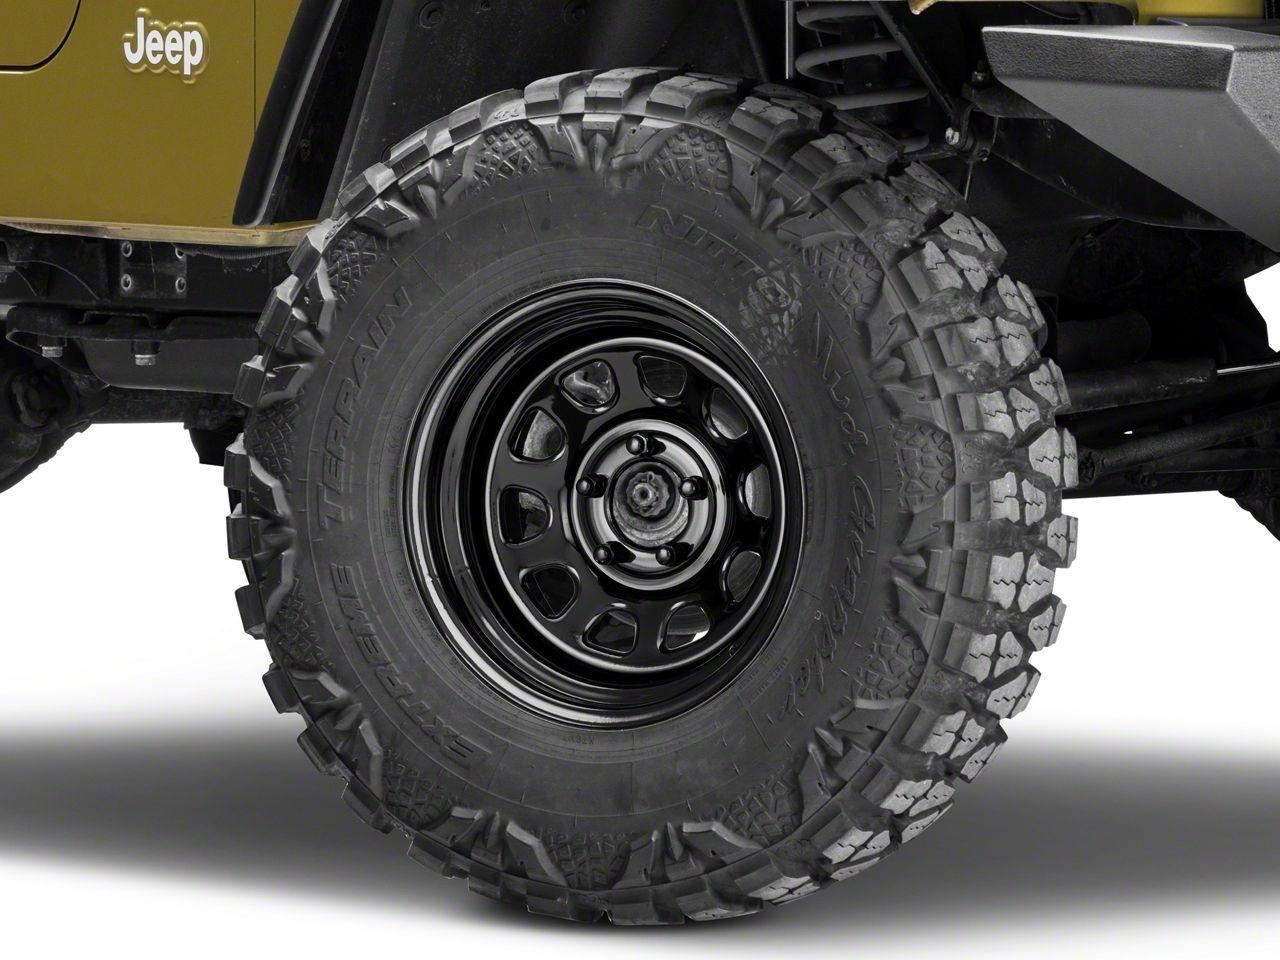 Pro Comp Steel Series 51 District Gloss Black Wheel - 15x8 (87-06 Jeep Wrangler YJ & TJ)